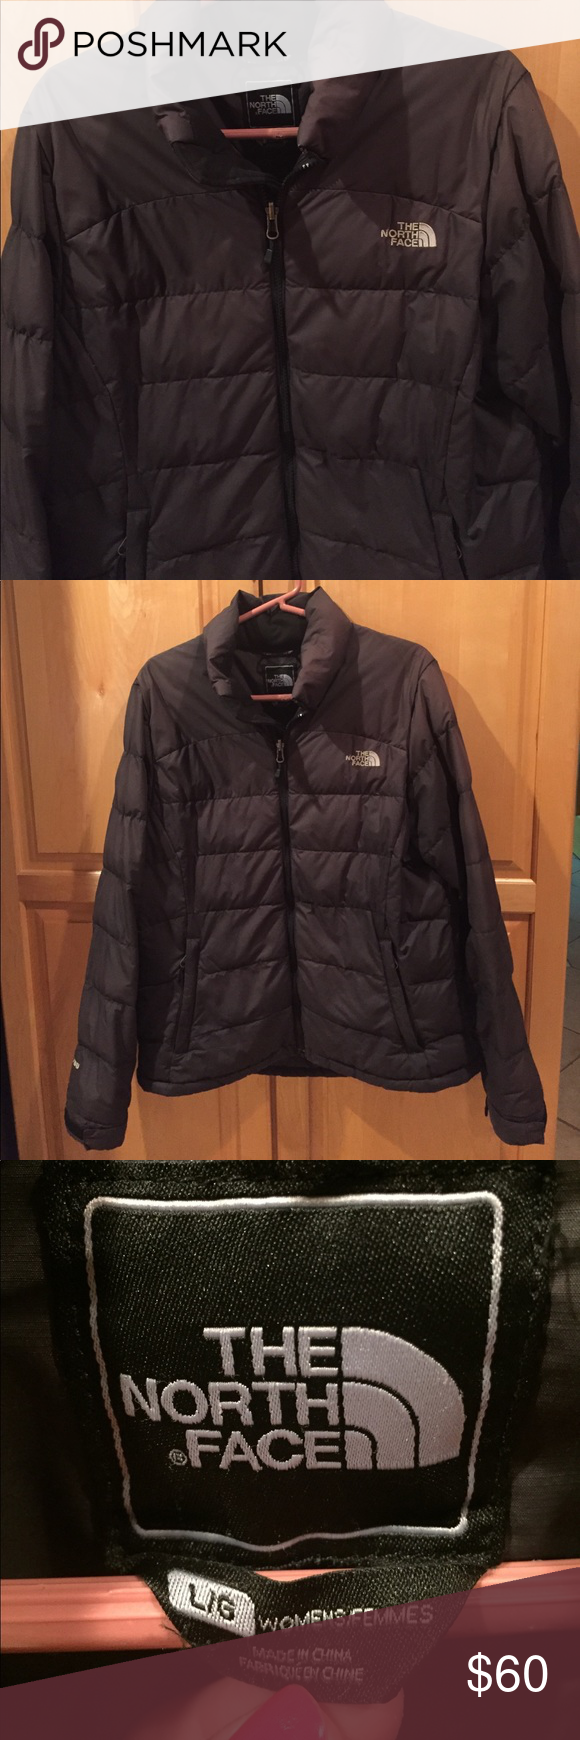 The North Face Nuptse Jacket North Face Nuptse Jacket Jackets Winter Outfits [ 1740 x 580 Pixel ]